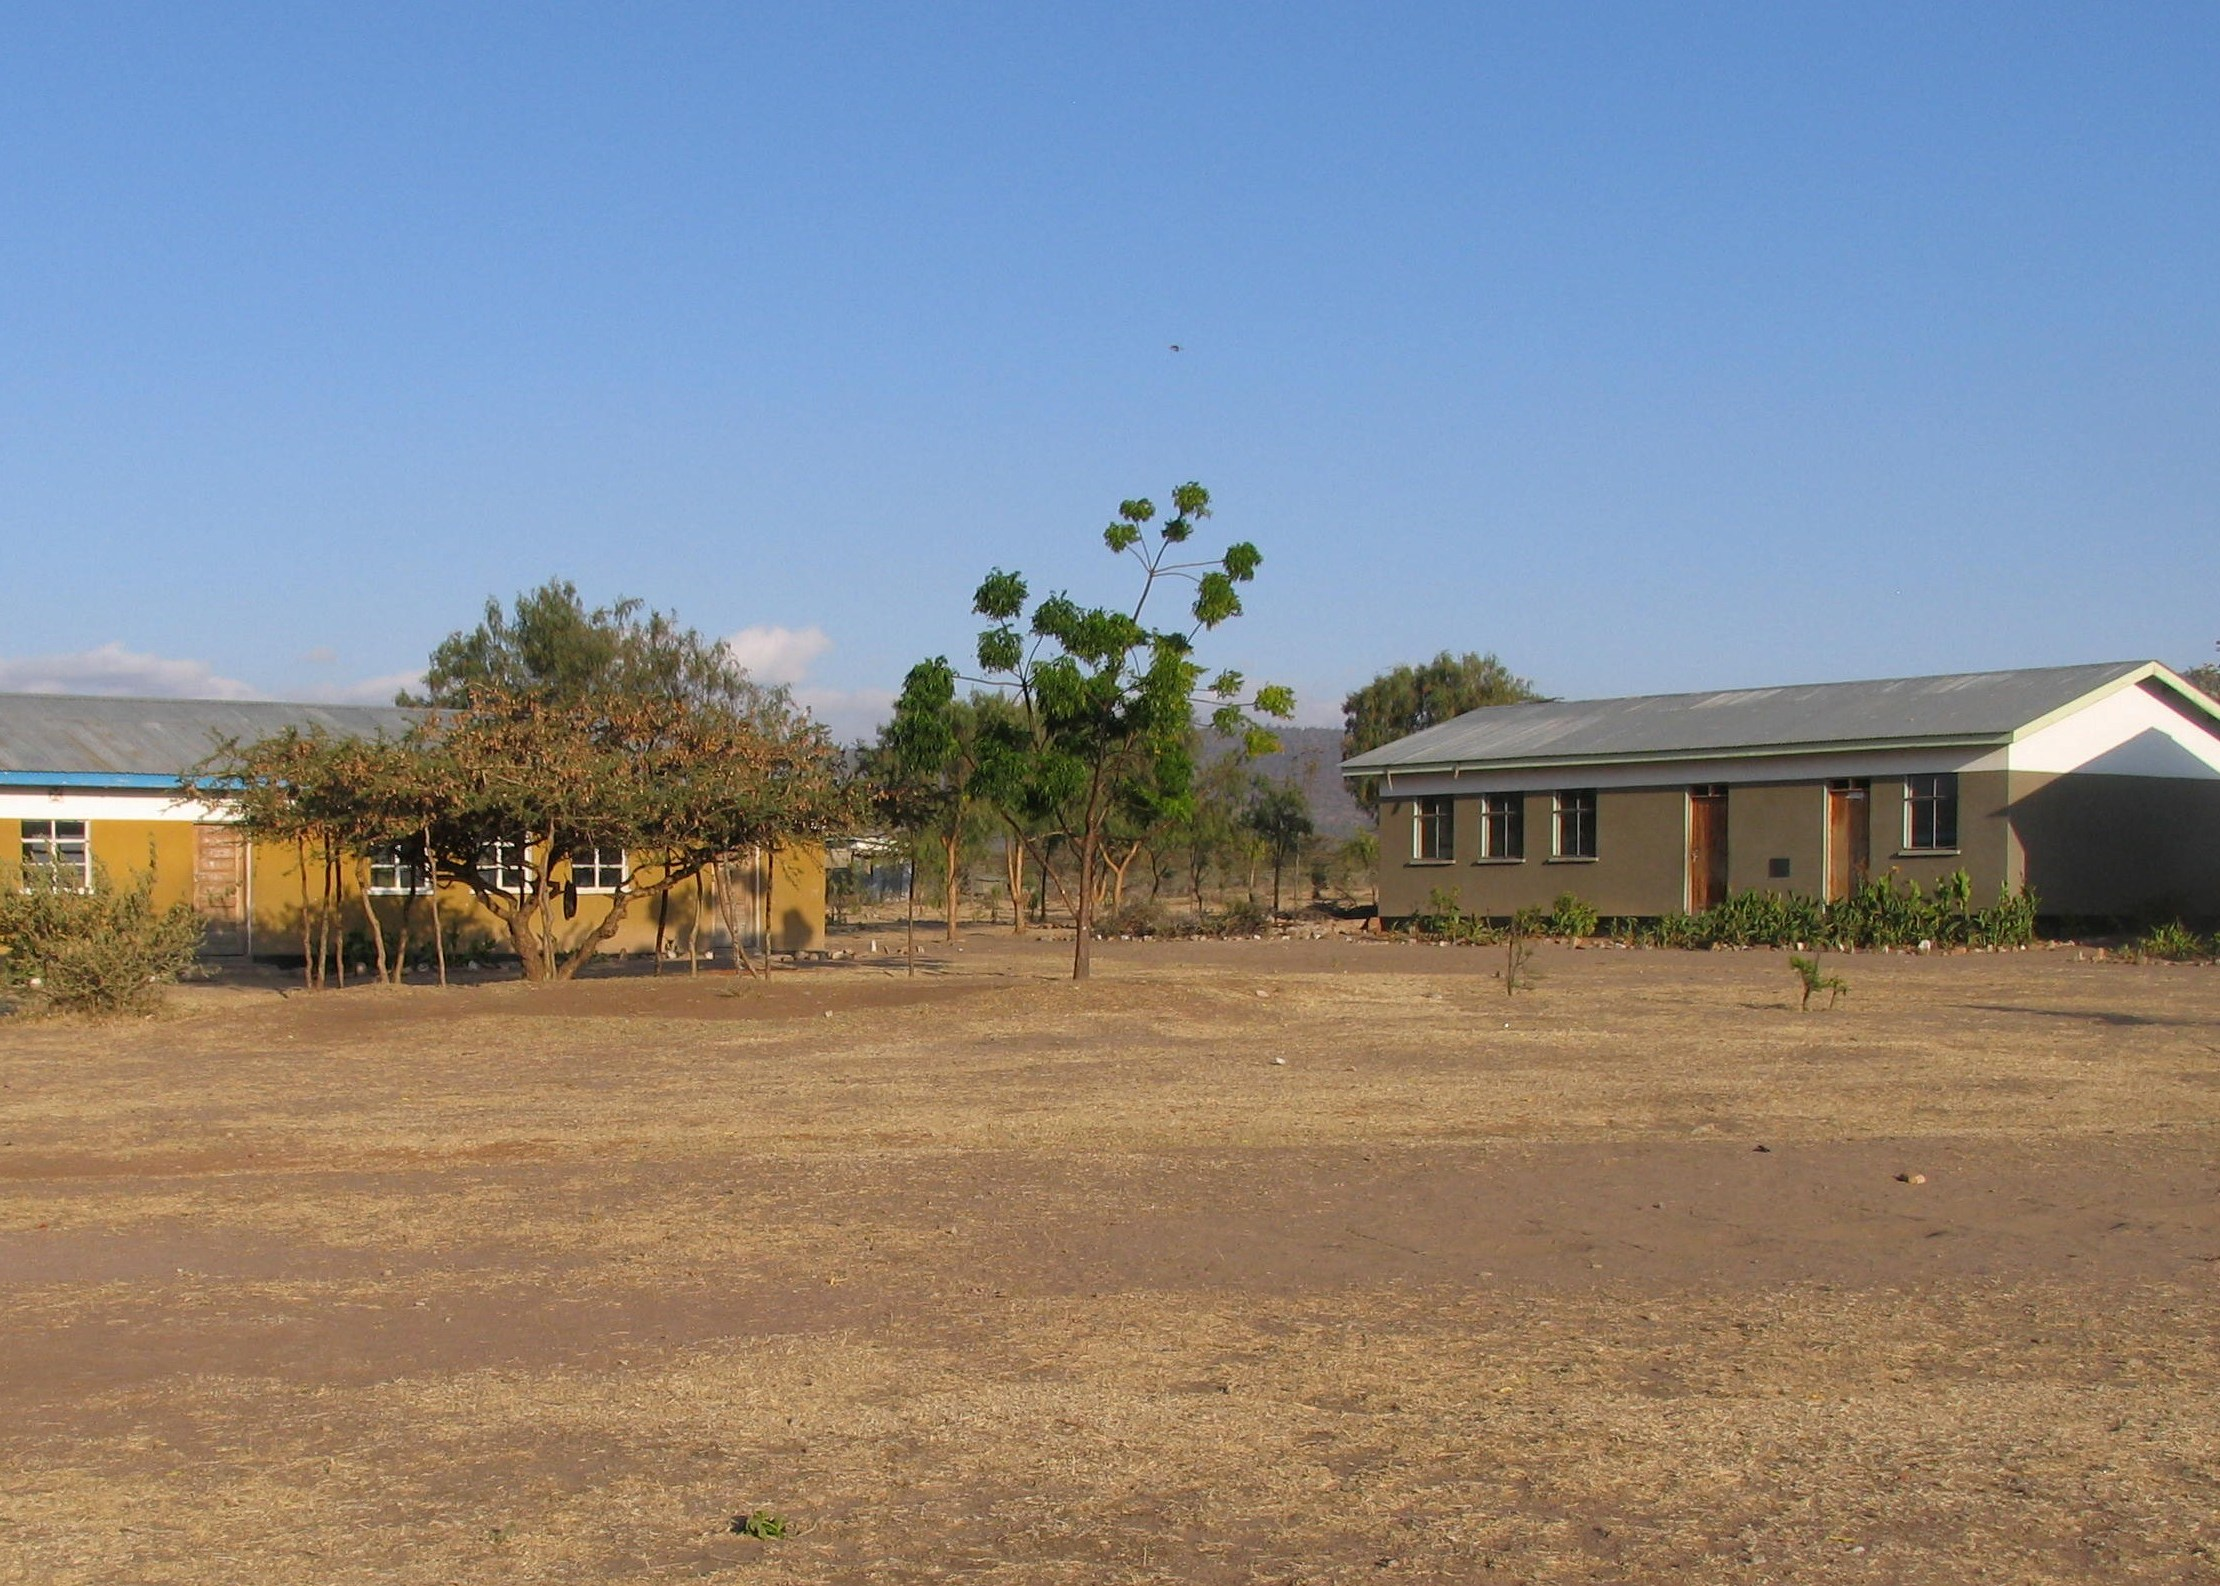 Sukenya School_crop.JPG